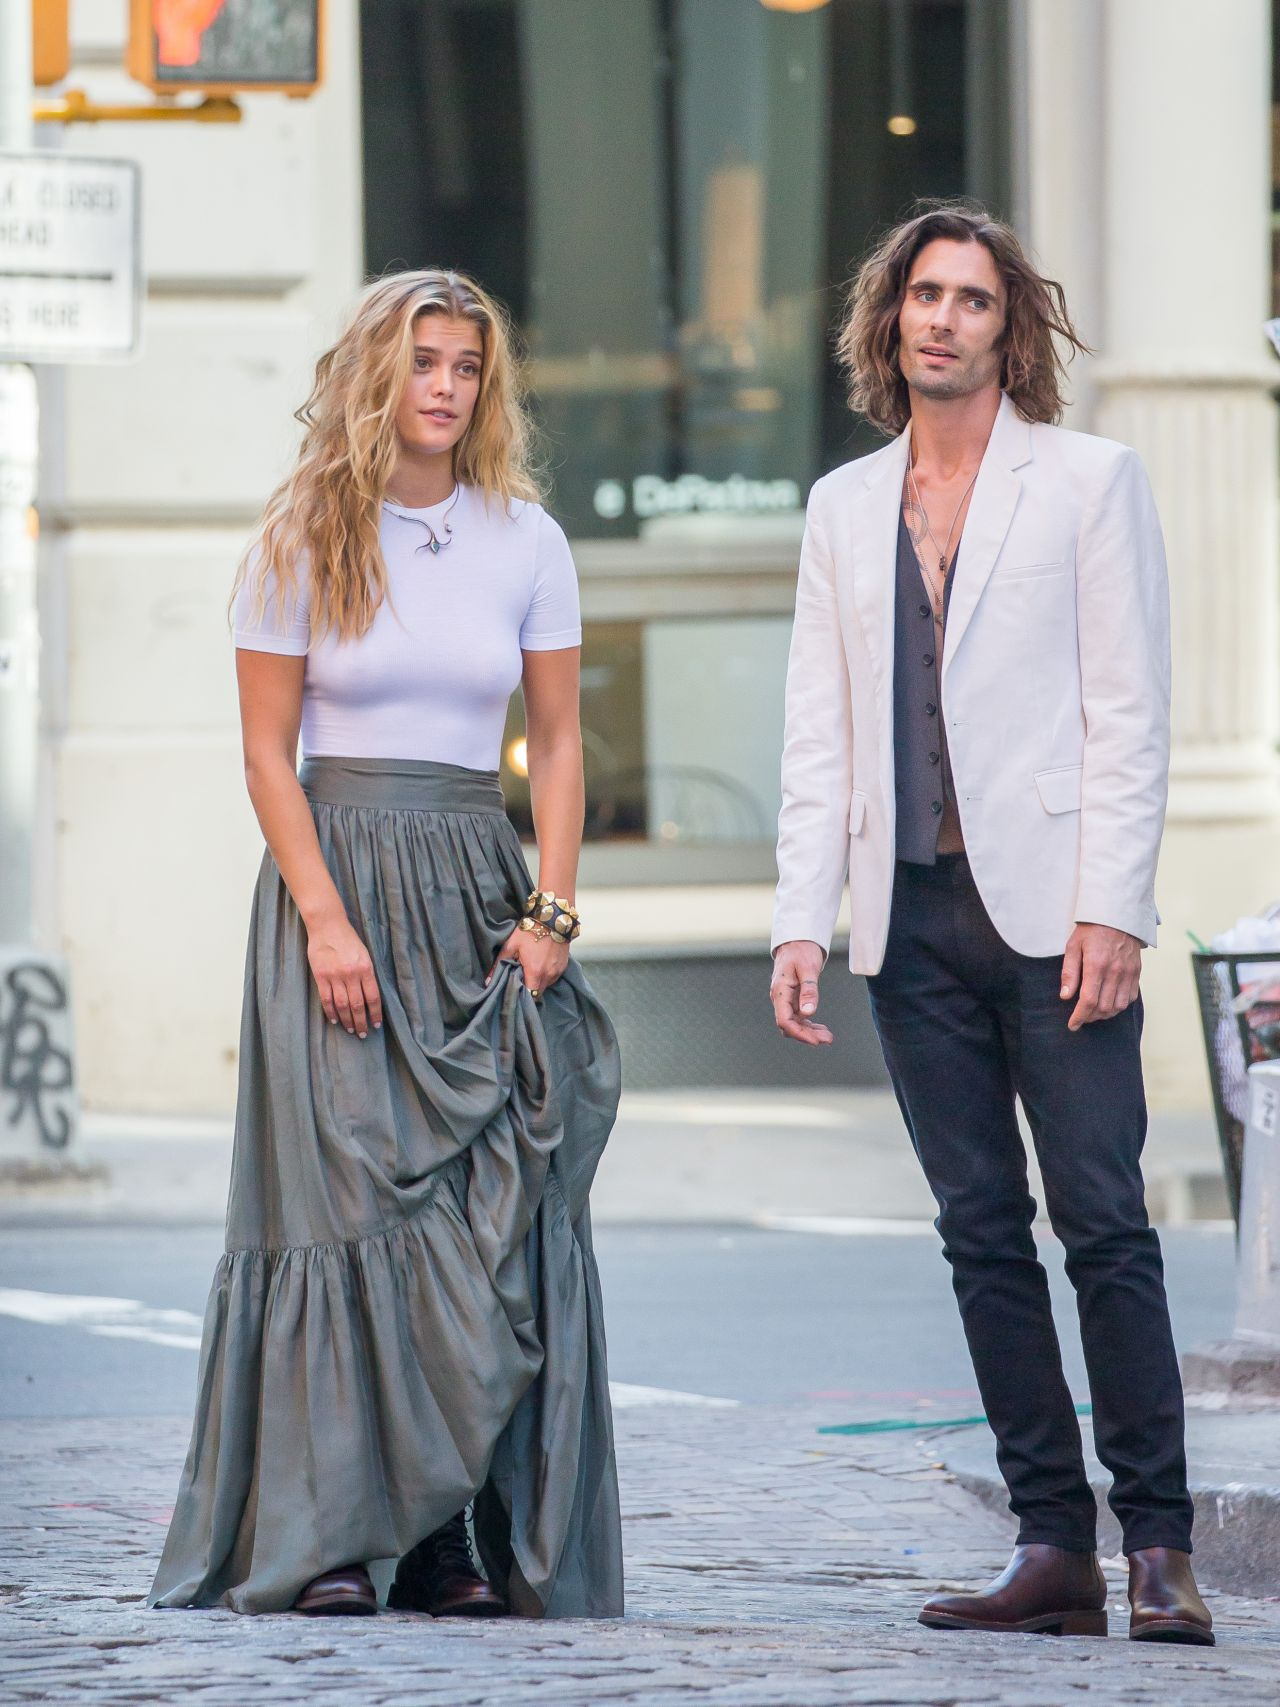 Nina Agdal And Singer Tyson Ritter Photoshoot In Soho